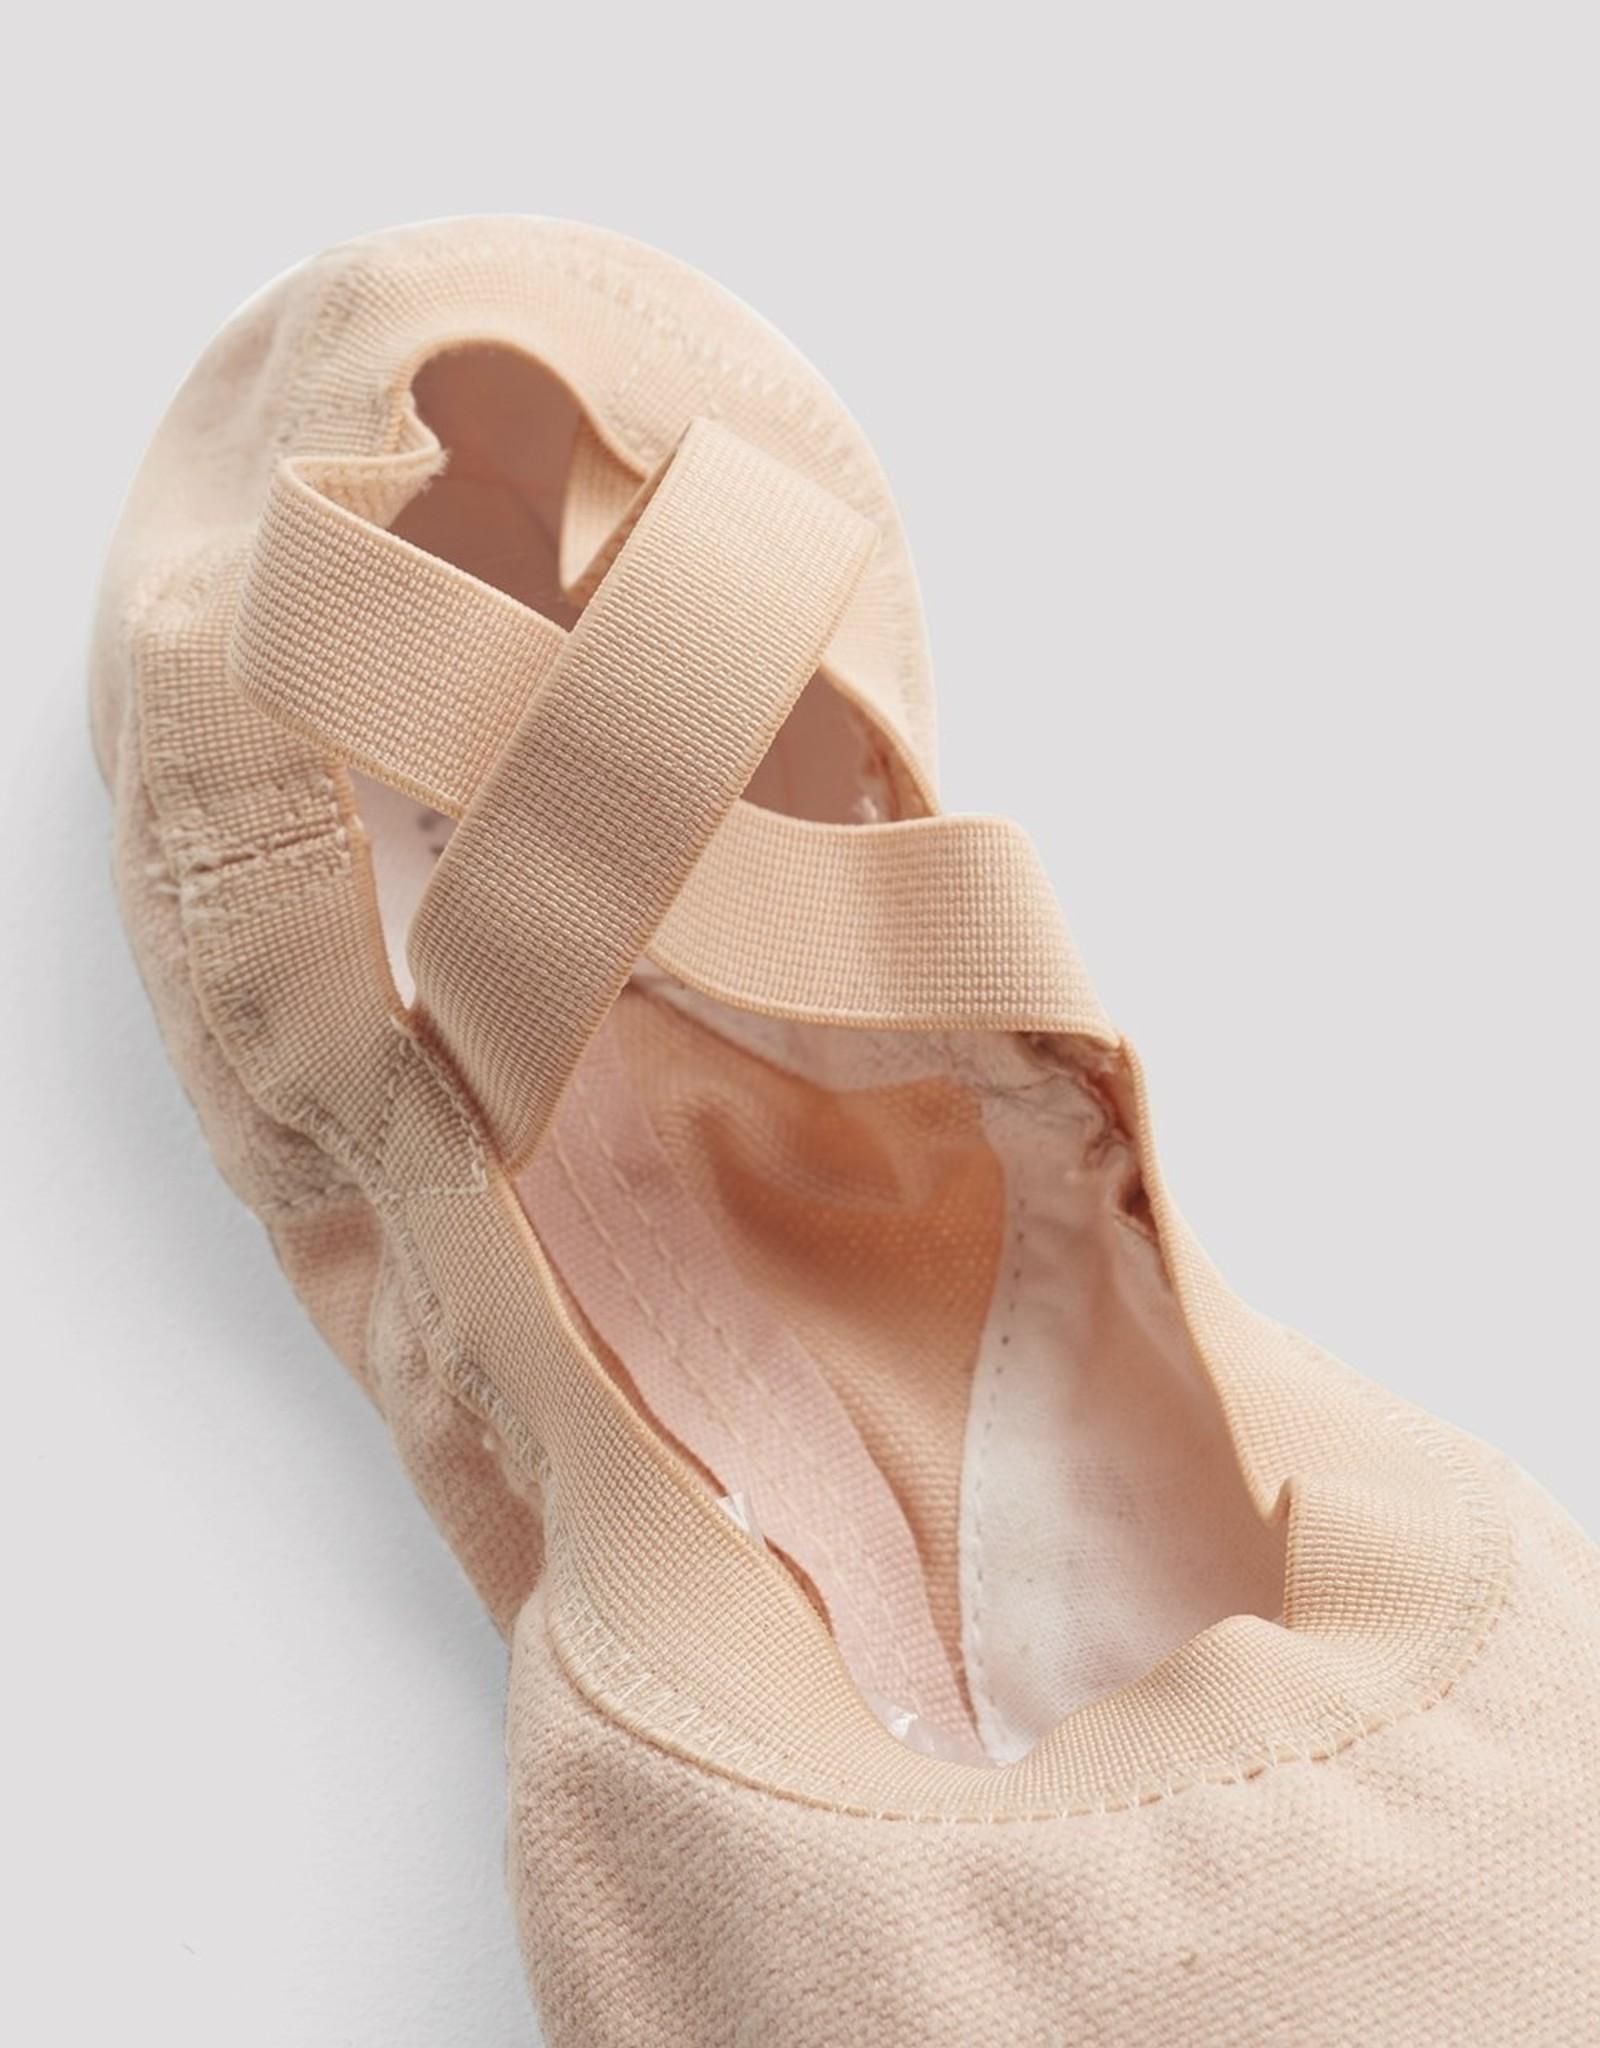 Bloch Bloch Pro Elastc Ballet Shoe S06021L